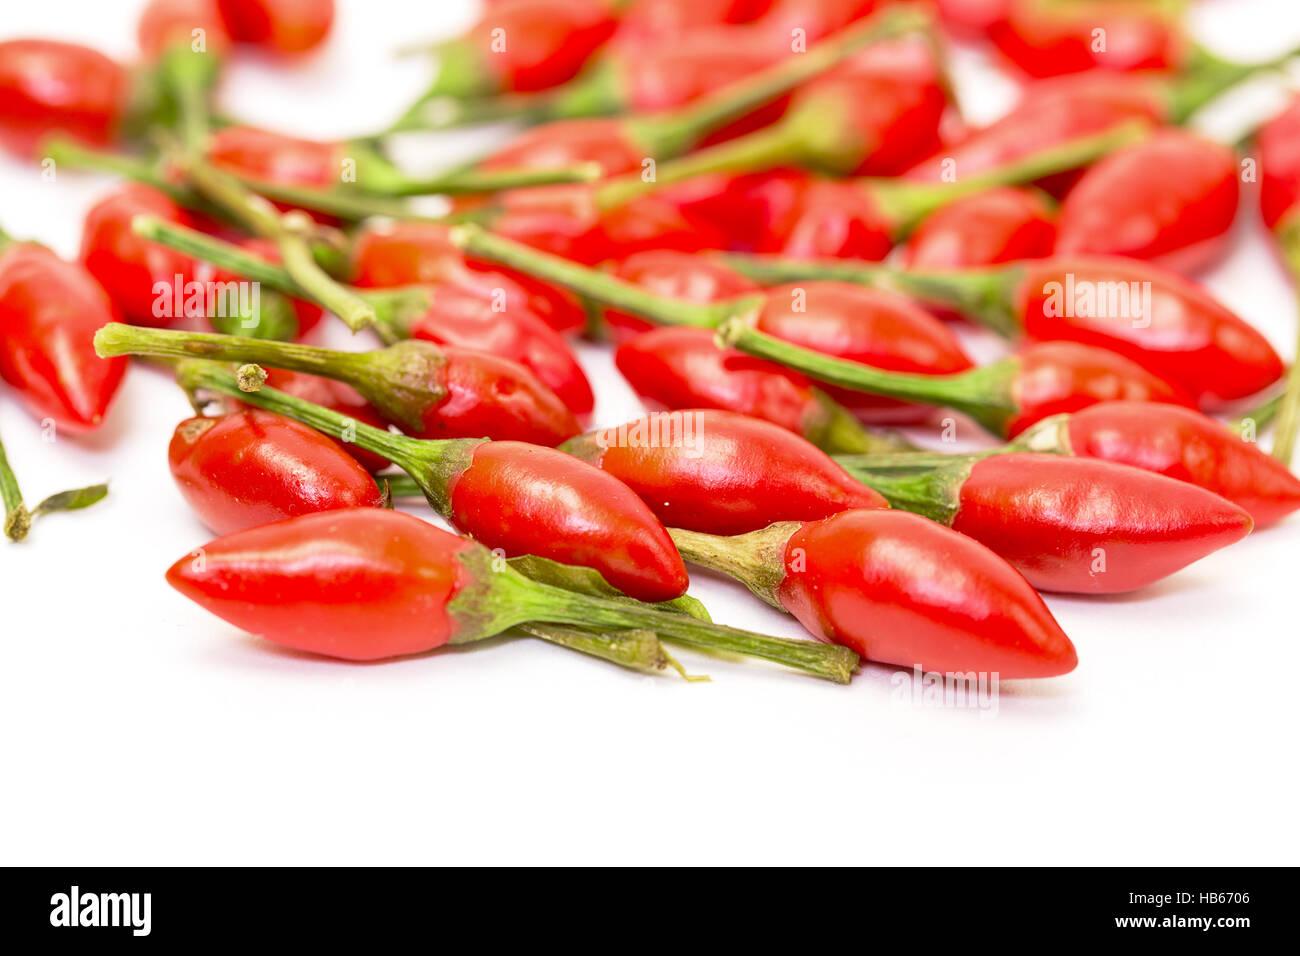 Haufen von Reife rote Paprika Piri-Piri Stockbild